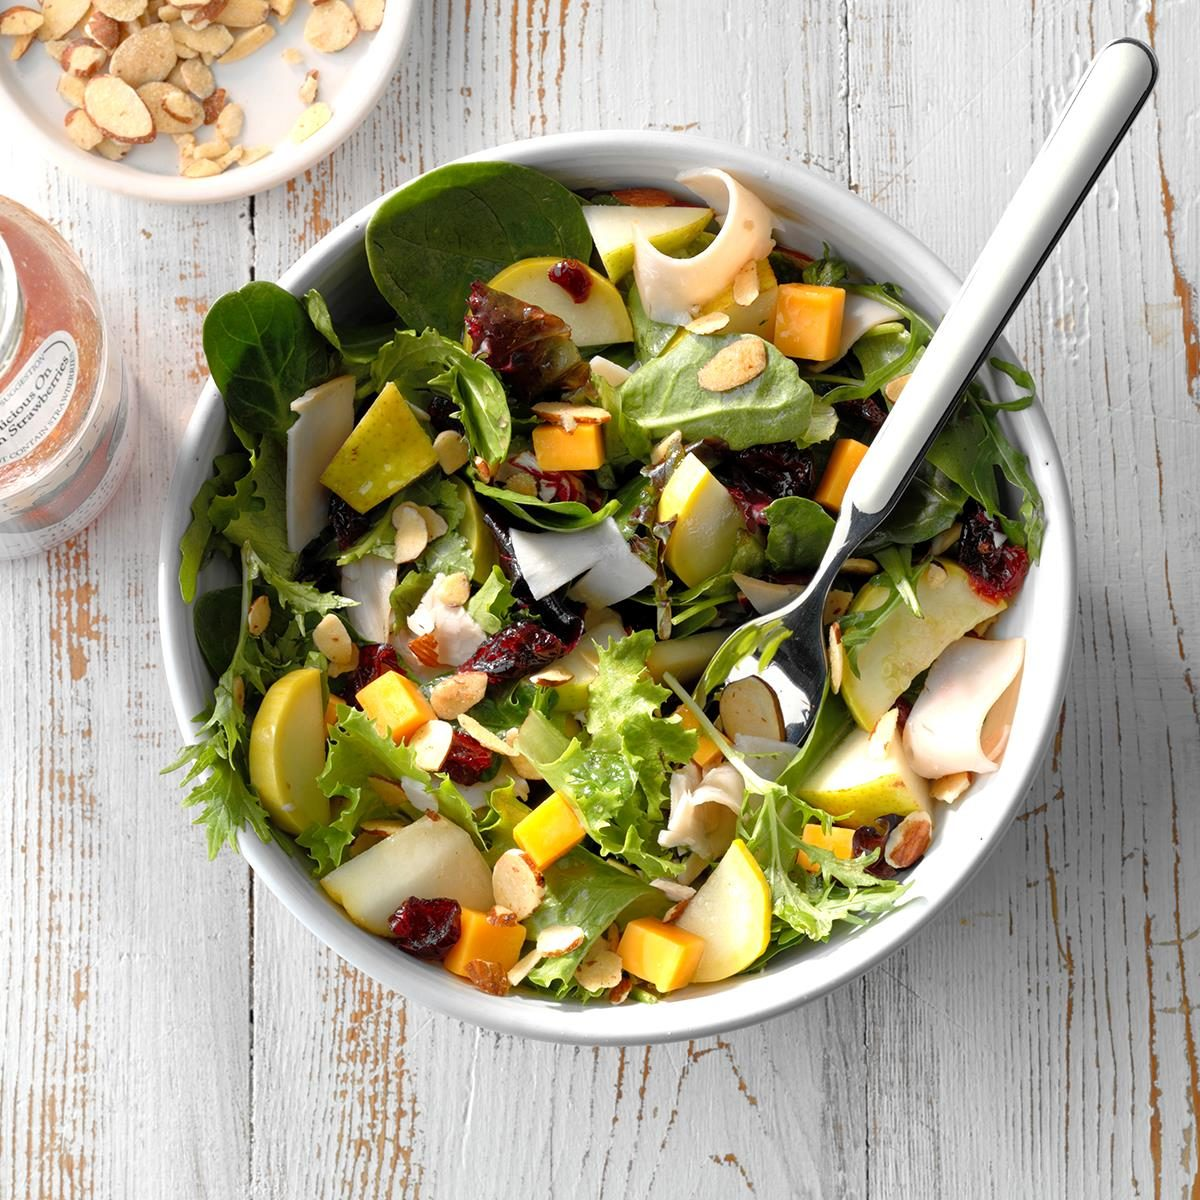 Thursday: Yellow Squash Turkey Salad